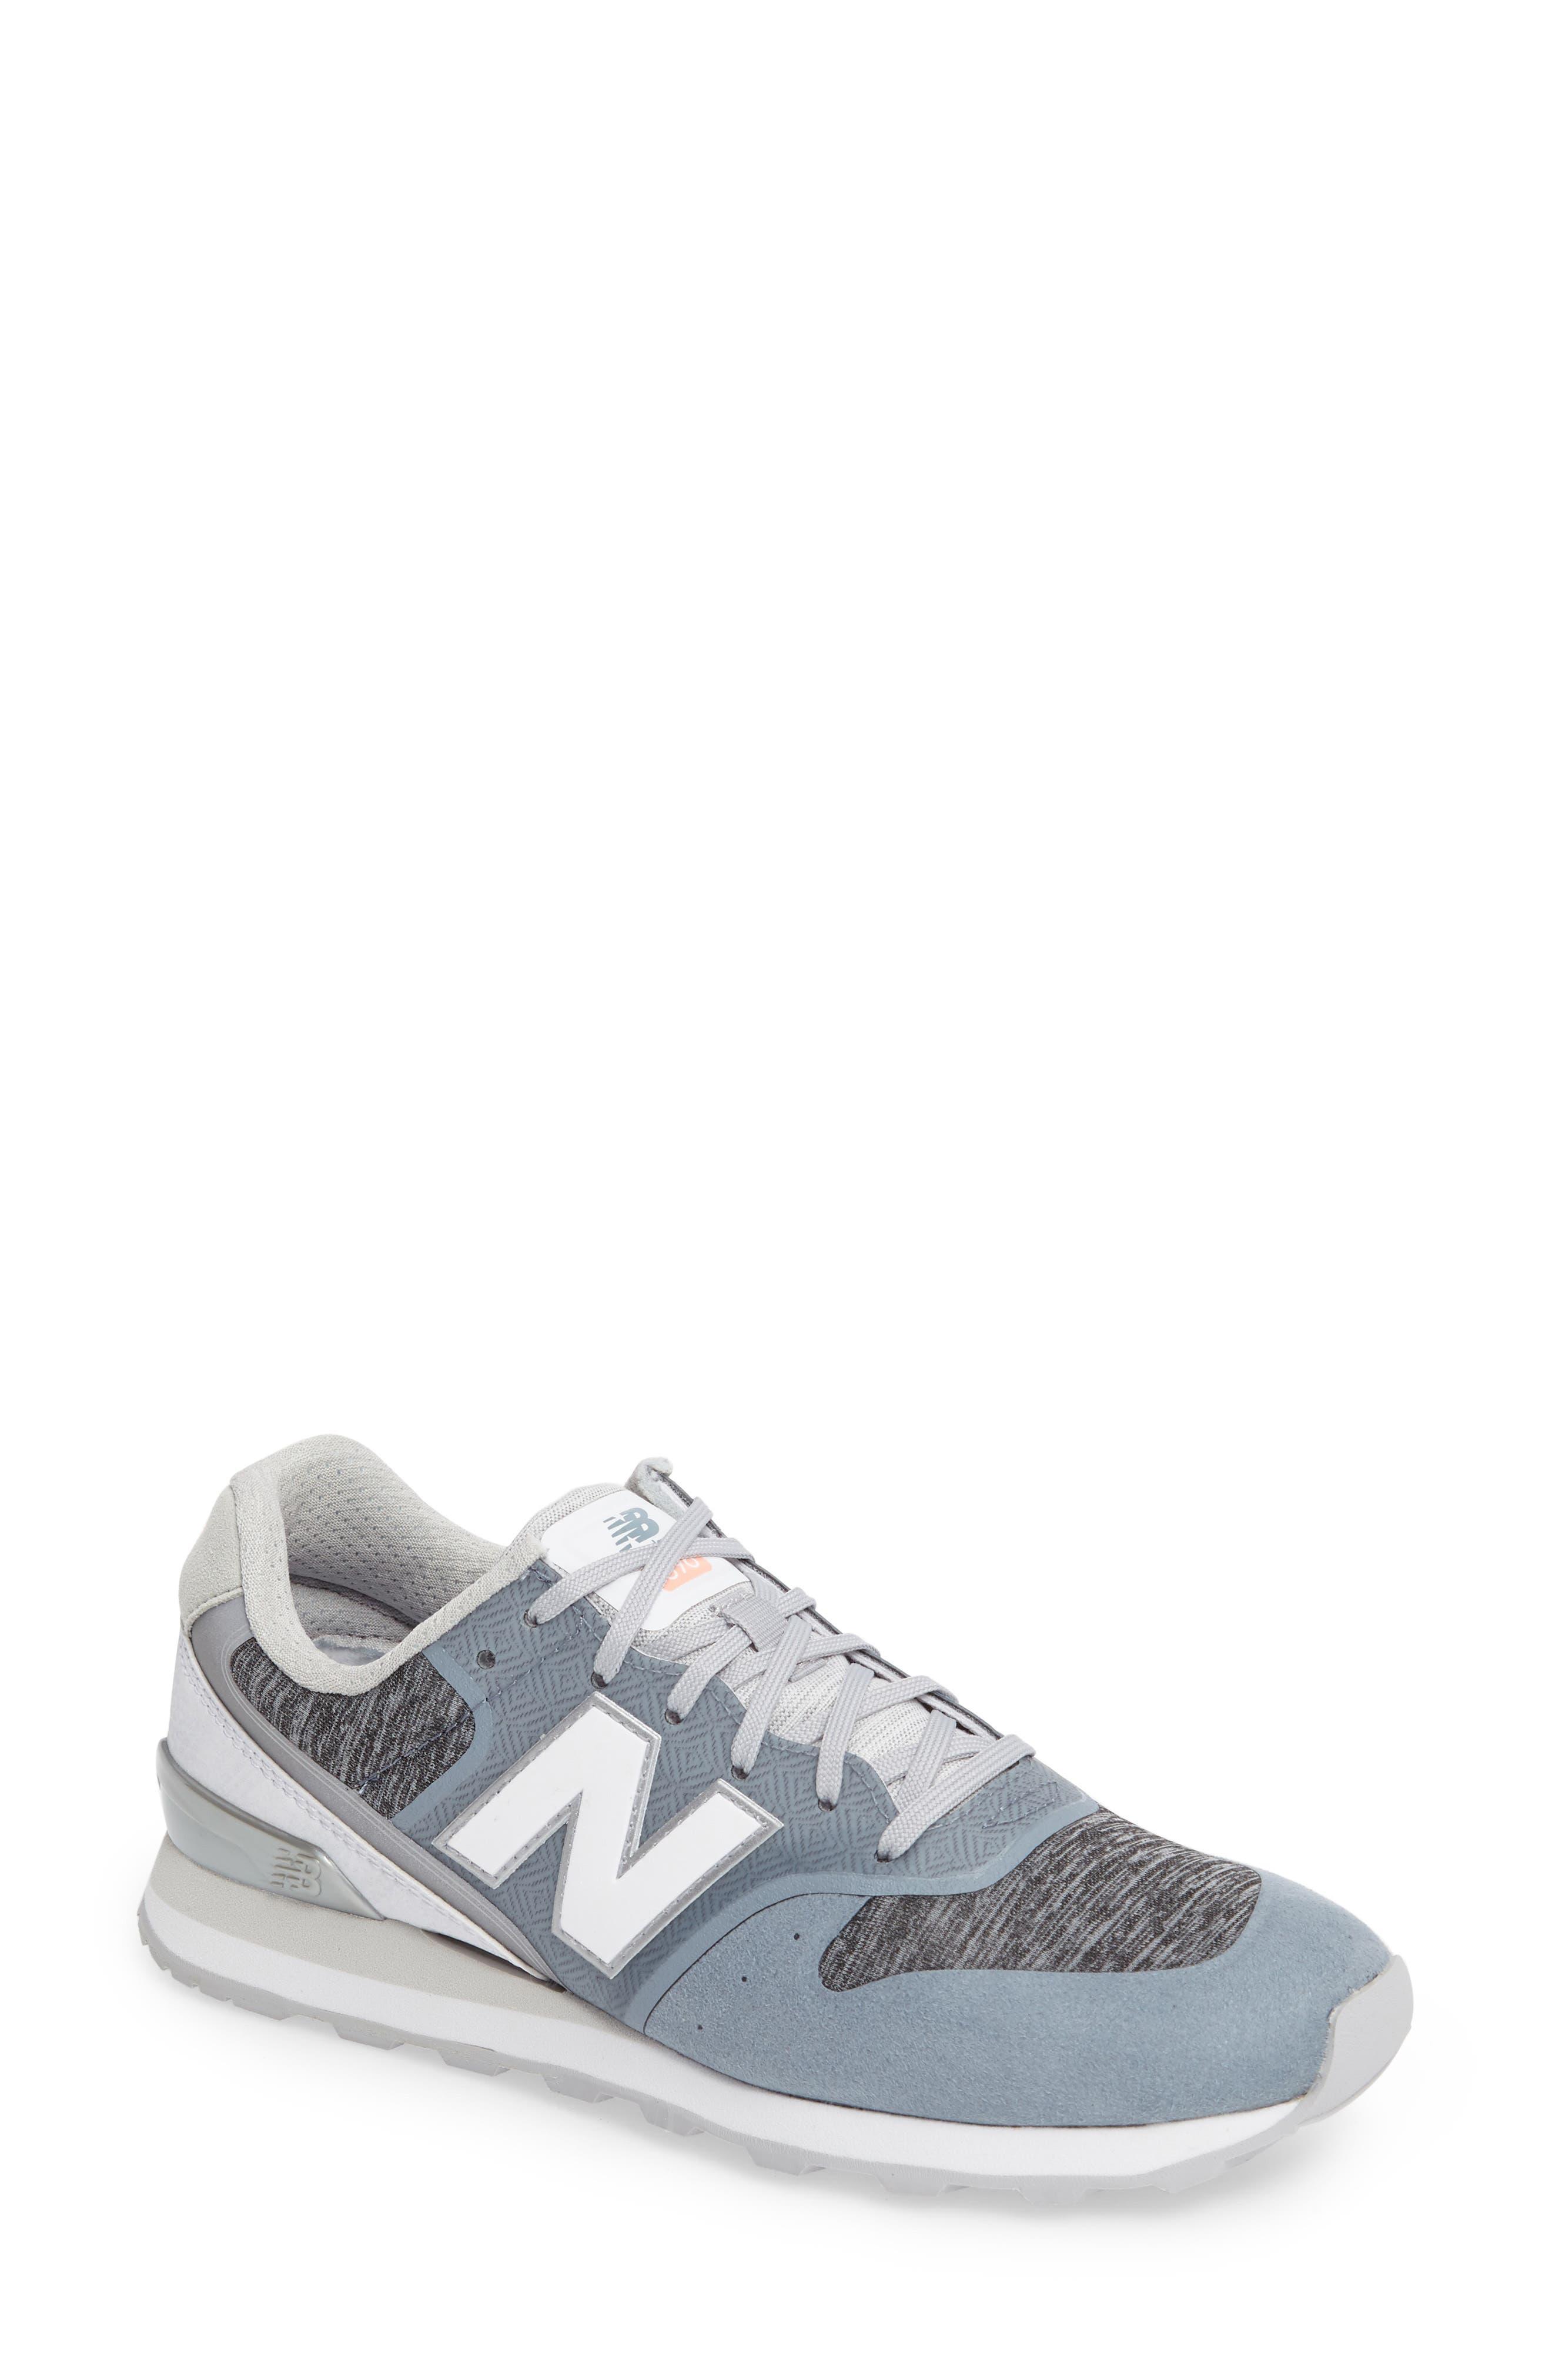 NEW BALANCE 696 Re-Engineered Sneaker